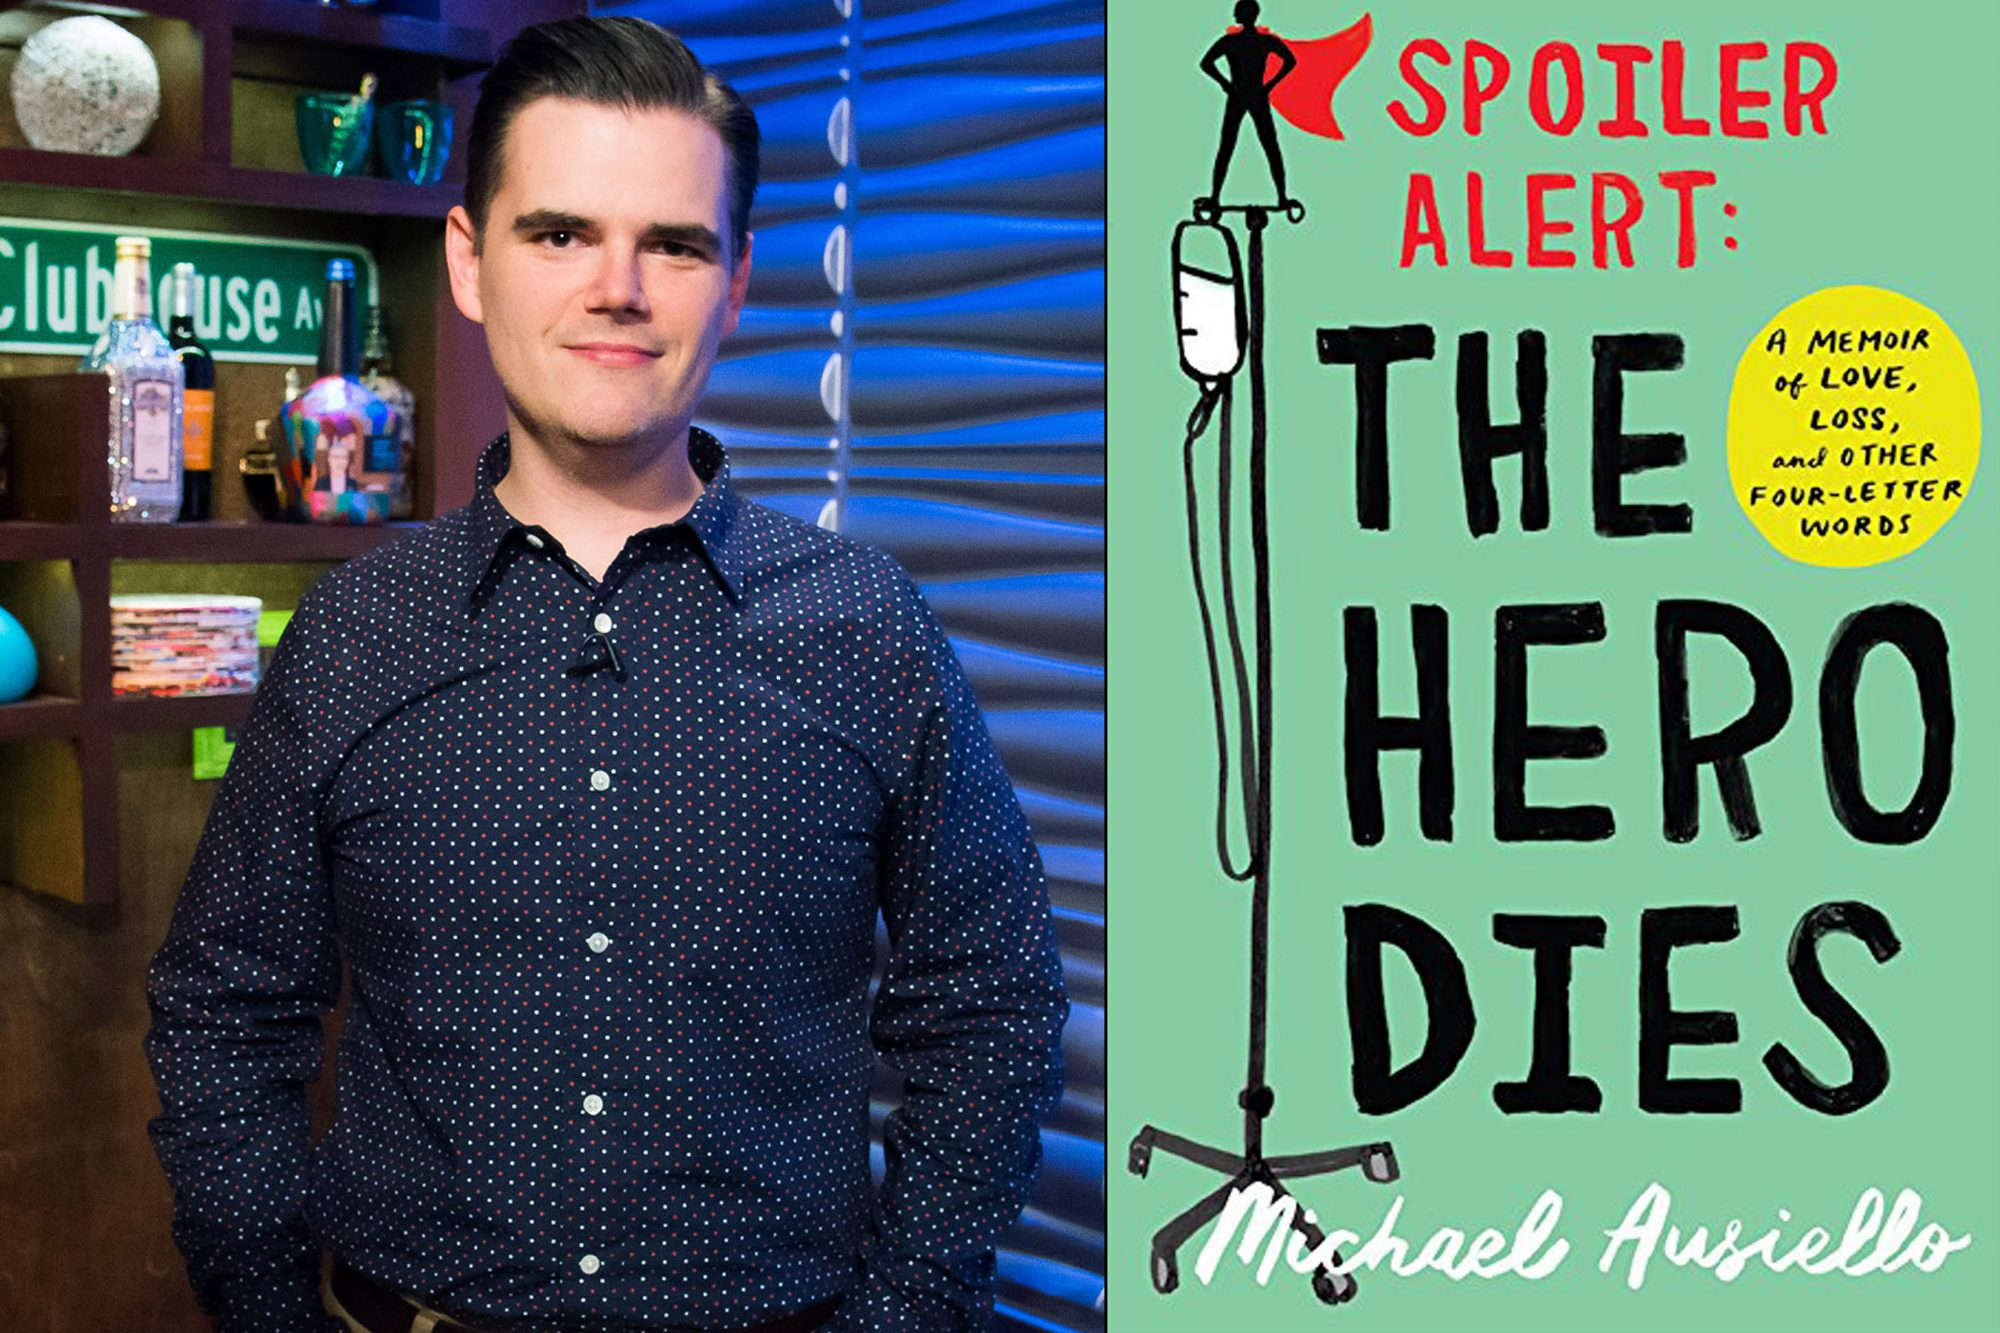 Spoiler Alert: The Hero Diesby Michael Ausiello